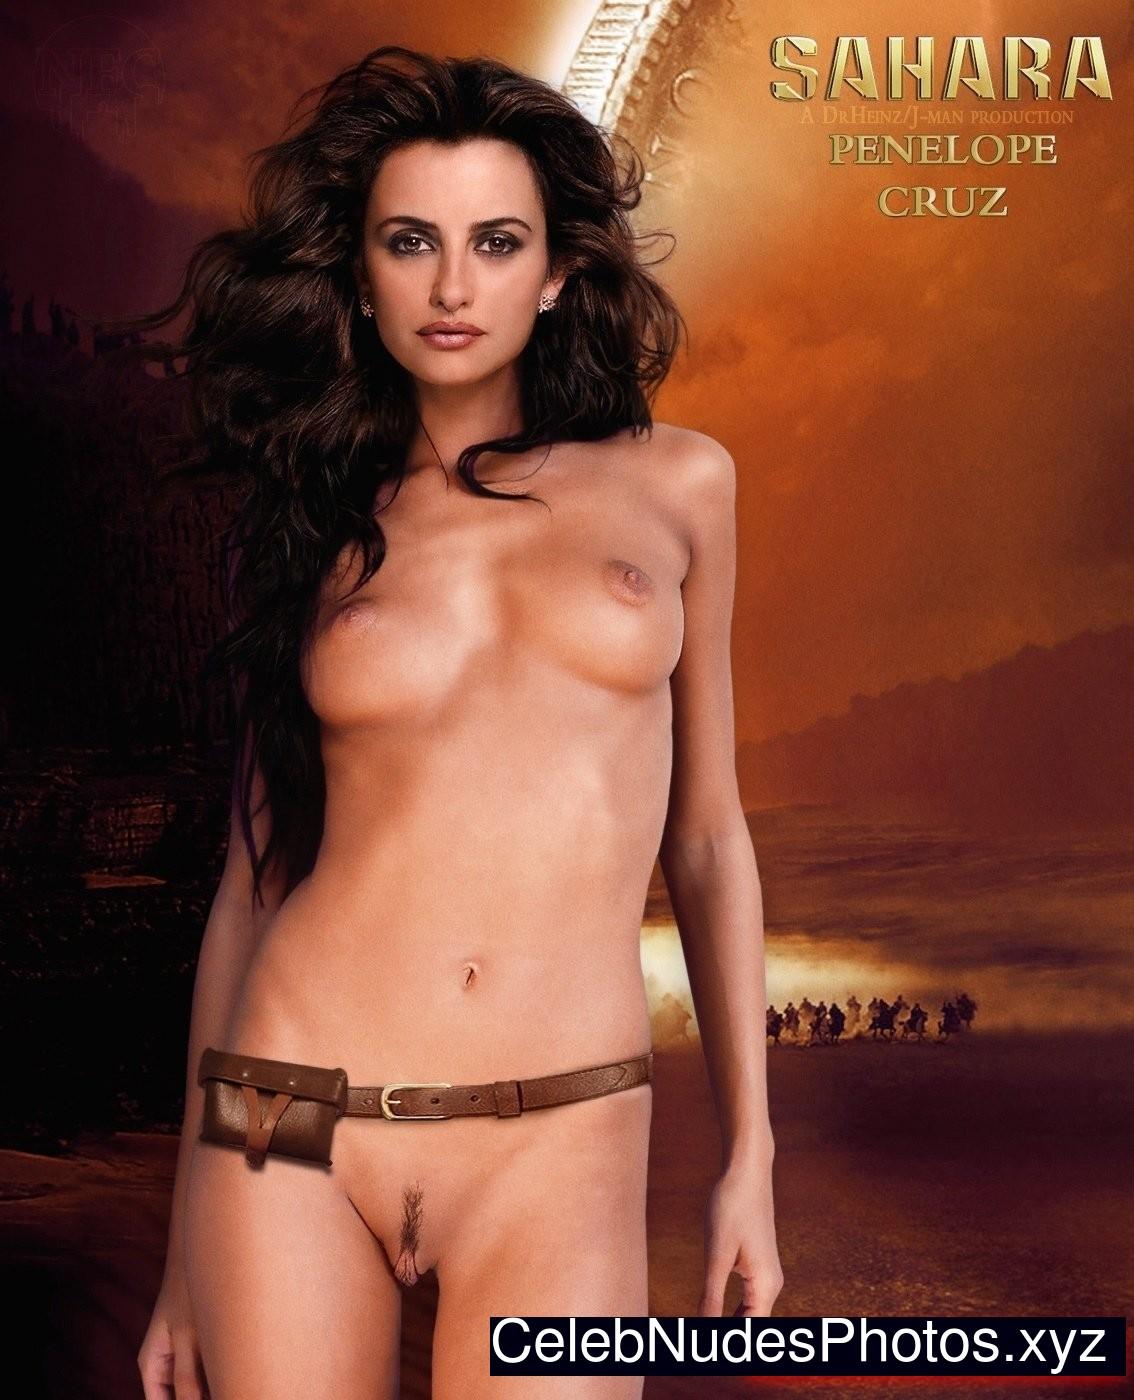 Penelope cruz celebrity nude would you